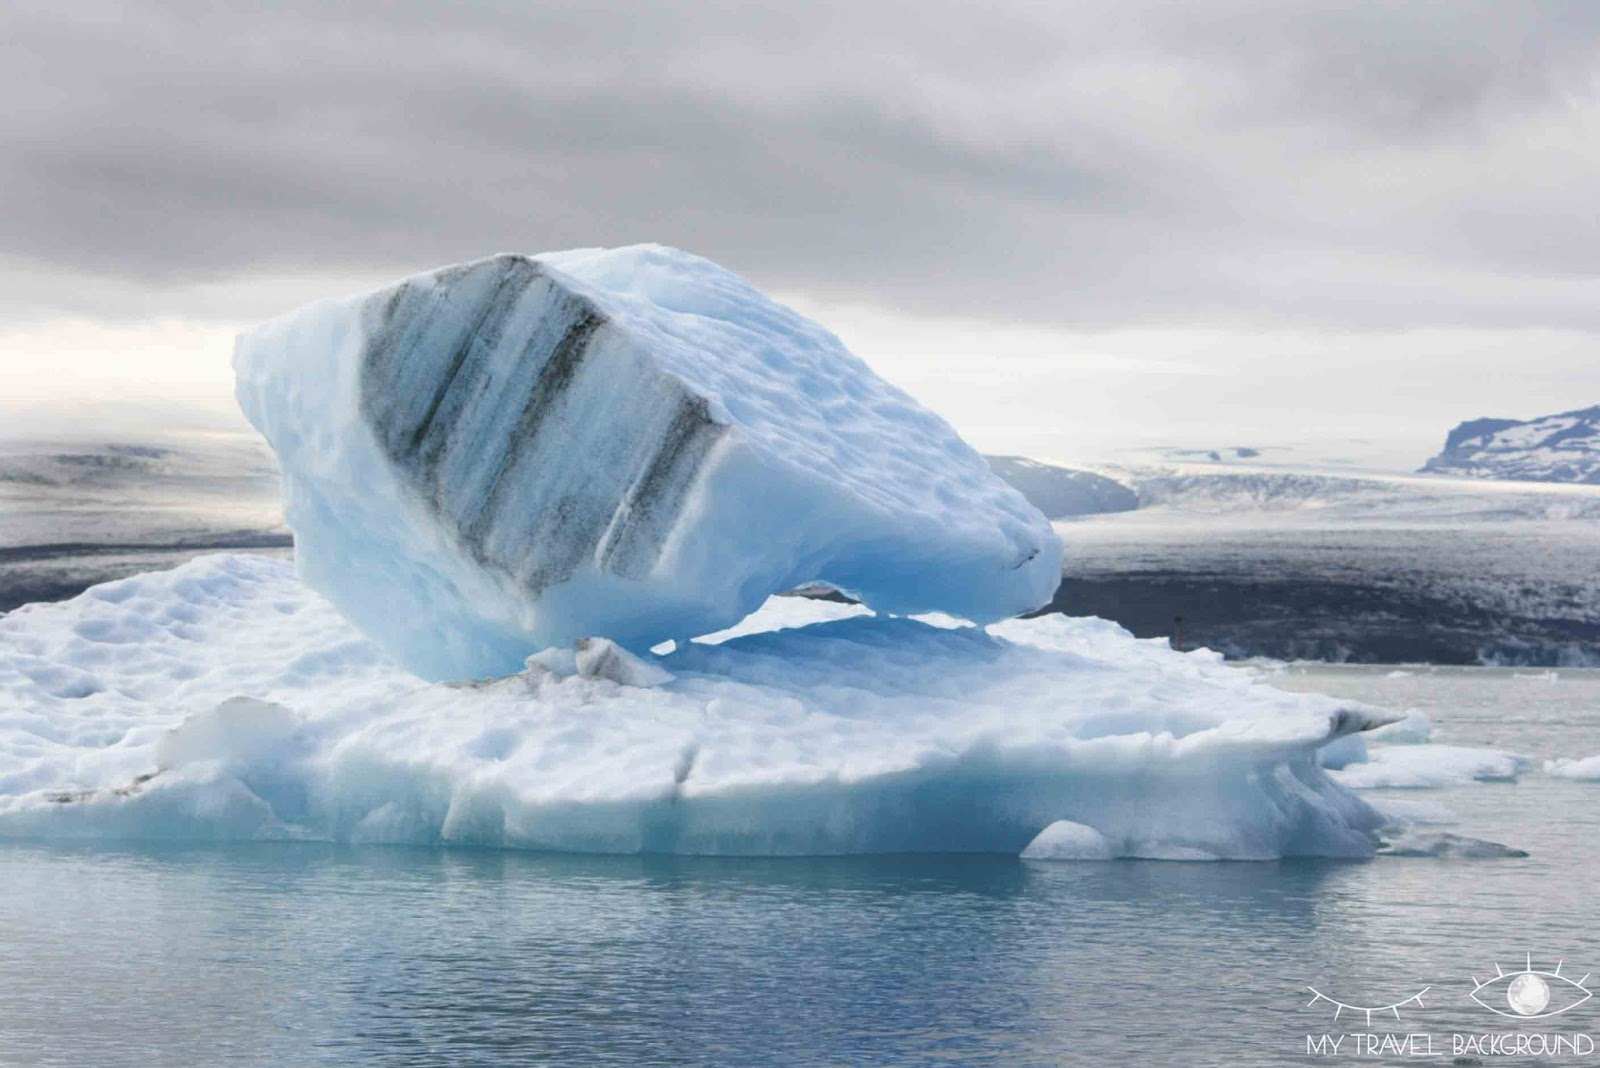 My Travel Background : Road Trip en Islande, itinéraire et infos pratiques / Glacier Jökulsarlon